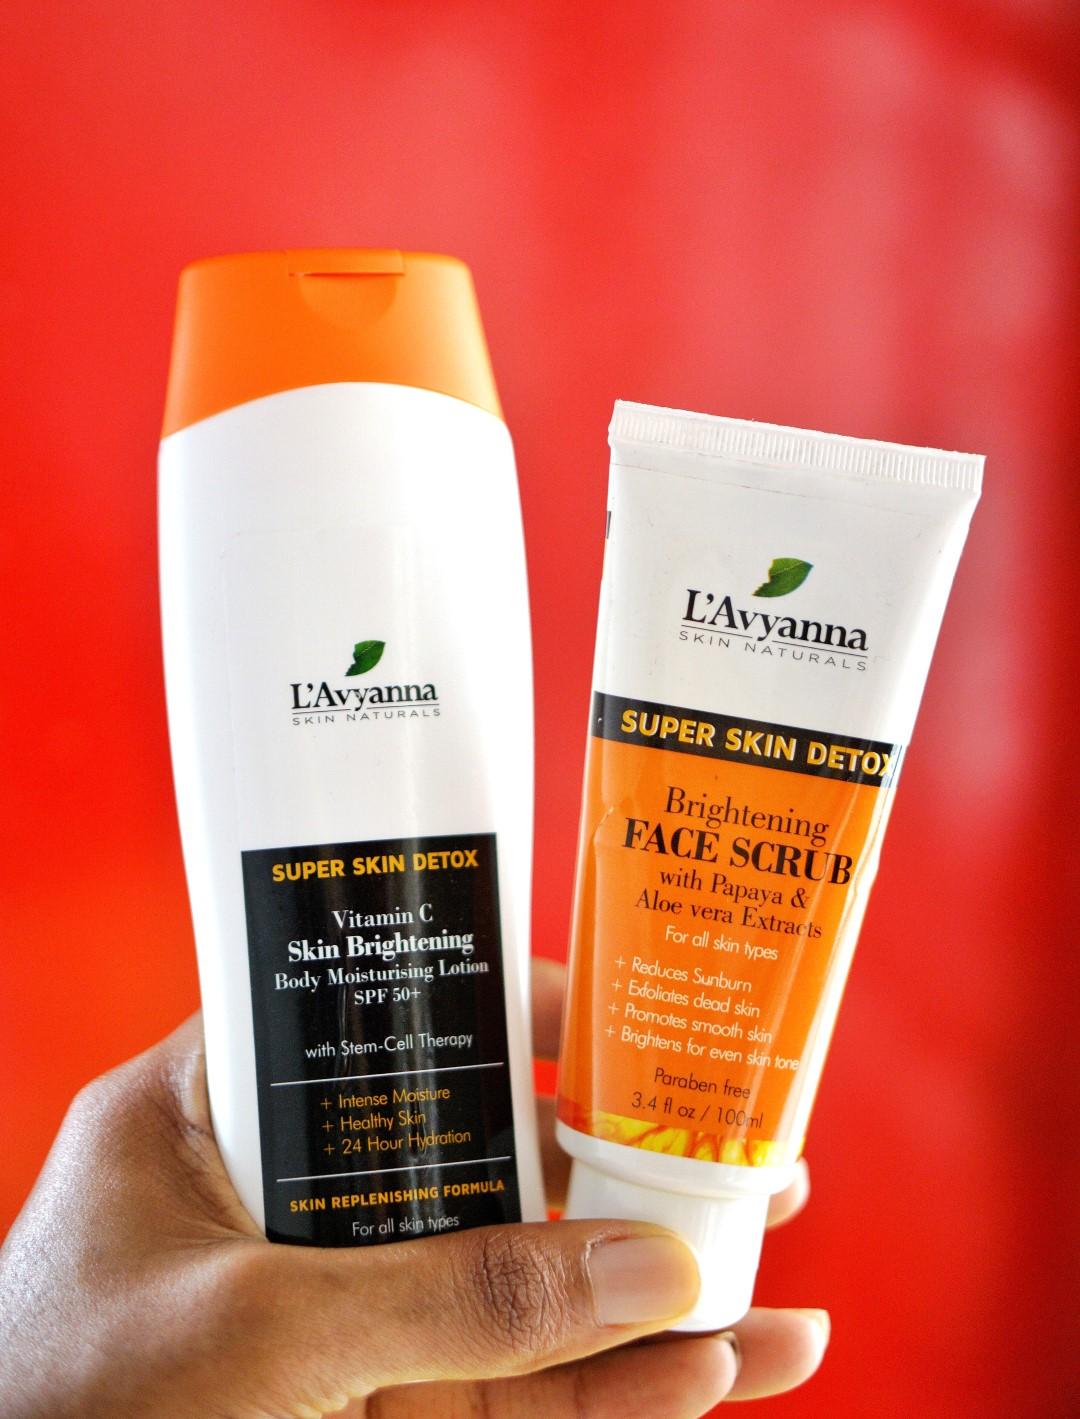 L'avyanna naturals products - super skin detox vitamin C lotion and face scrub